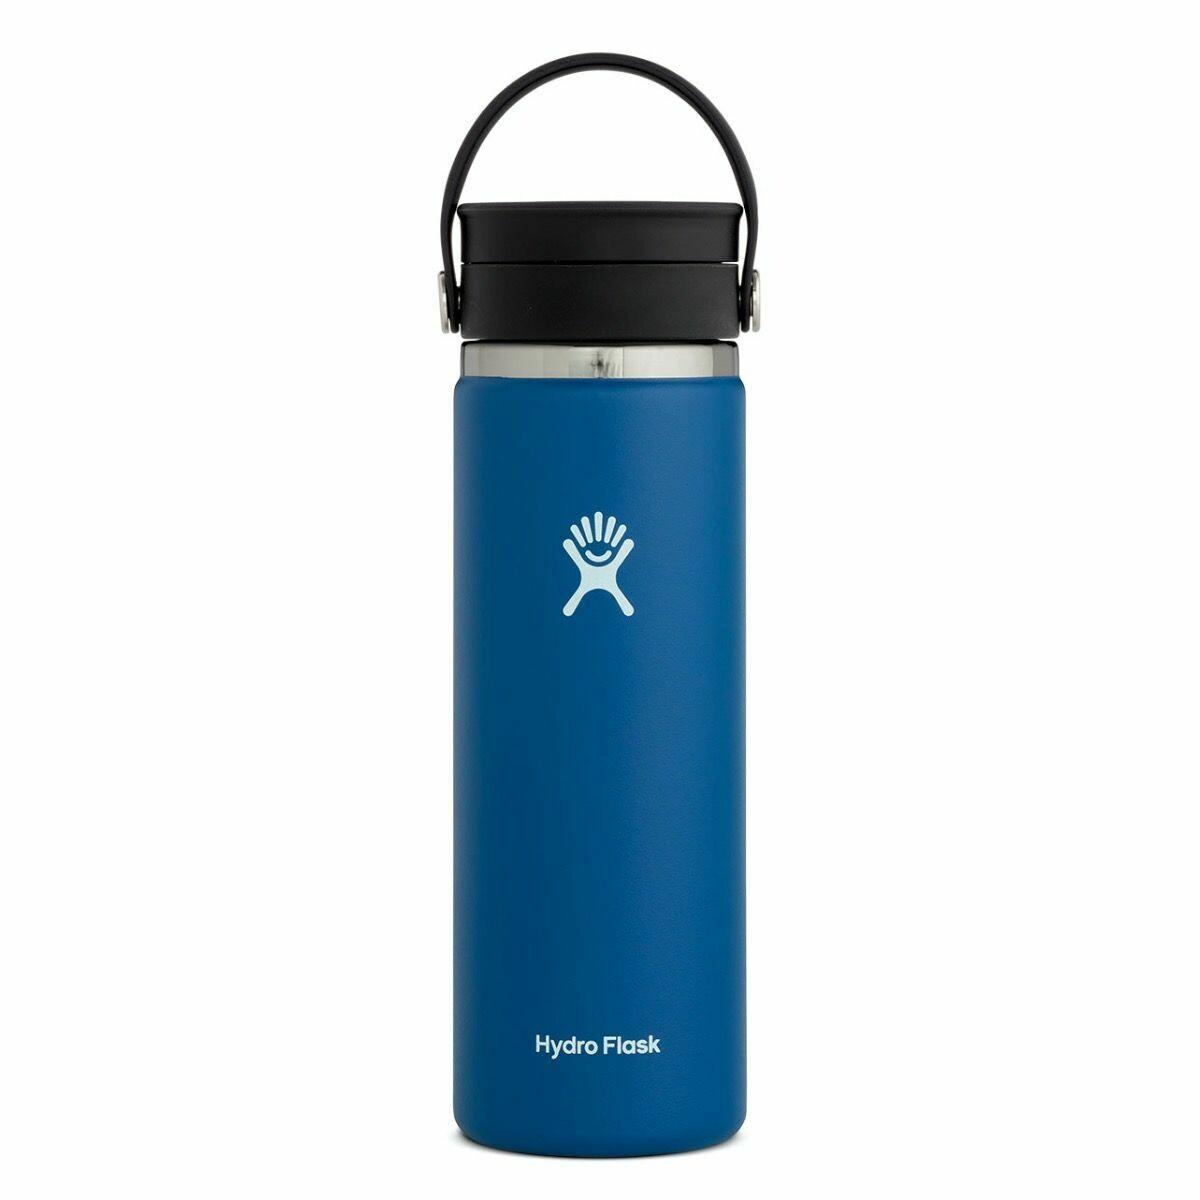 Hydro Flask 20 oz Wide Mouth w/Flex Sip Lid COBALT